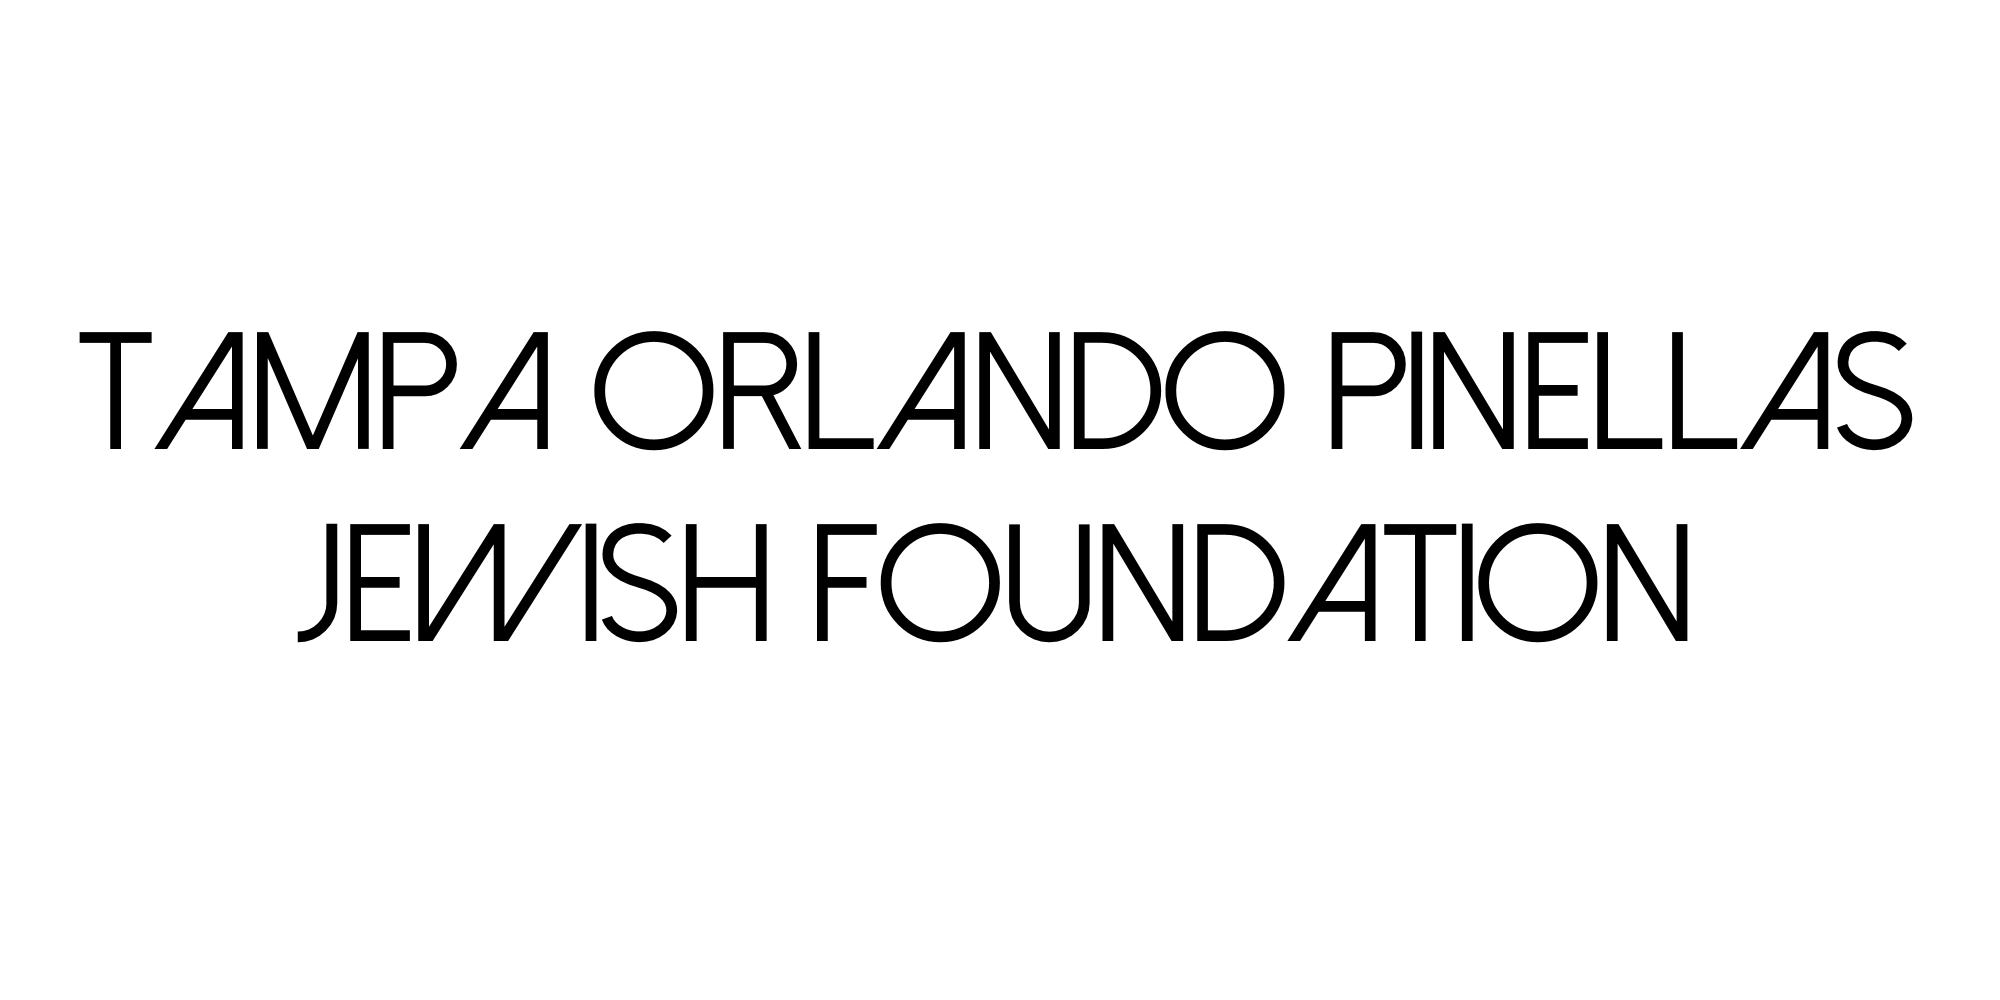 Tampa Orlando Pinellas Jewish Foundation.png